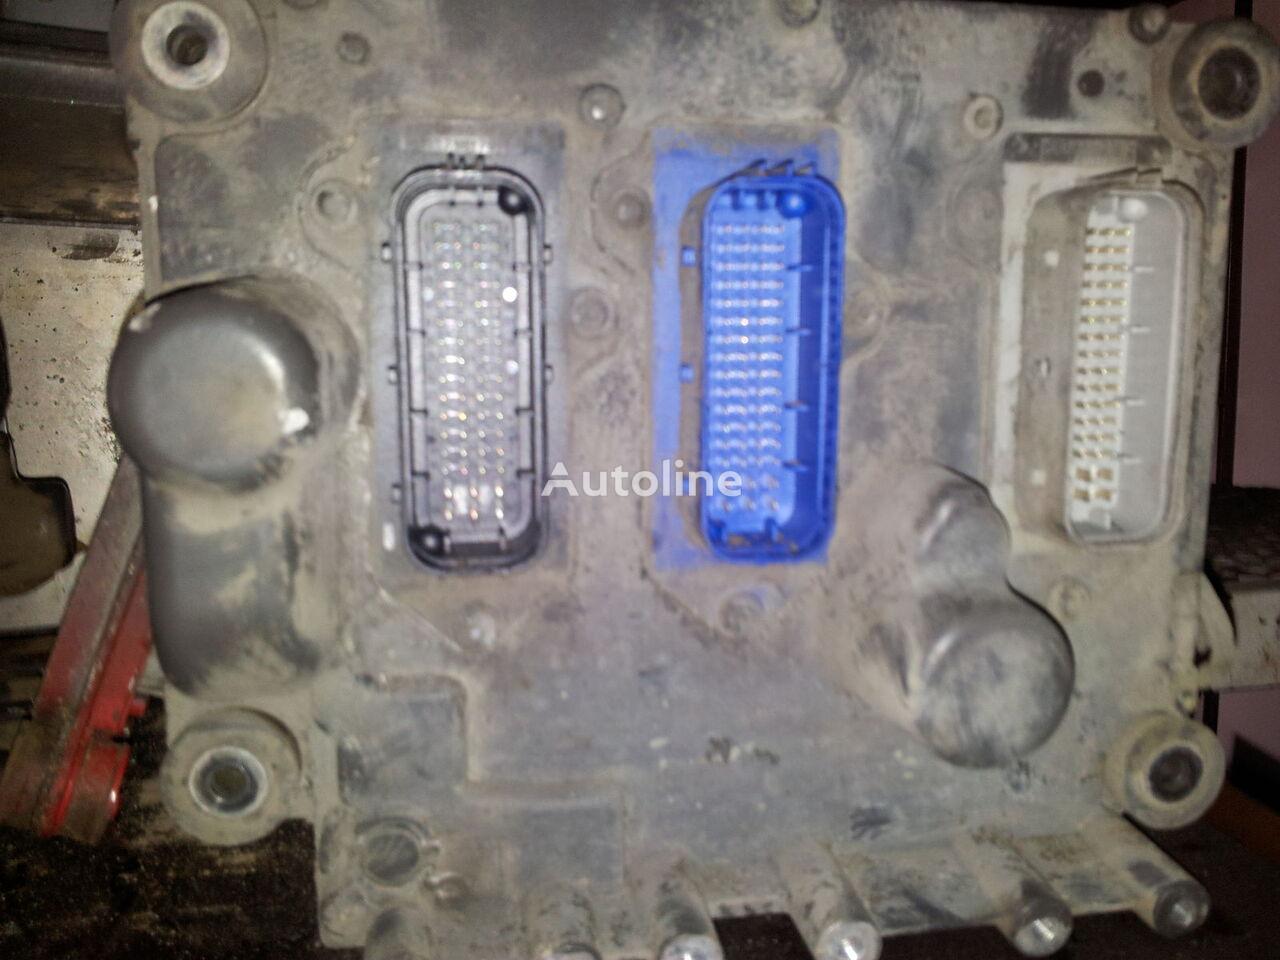 DAF 105XF EURO5 electronic control unit ECU EDC engine managment, engine control unit, DMCI 1679021; 1684367, 1664539, 1679021, 1684367, 1887331 bloco de controlo para DAF 105XF camião tractor